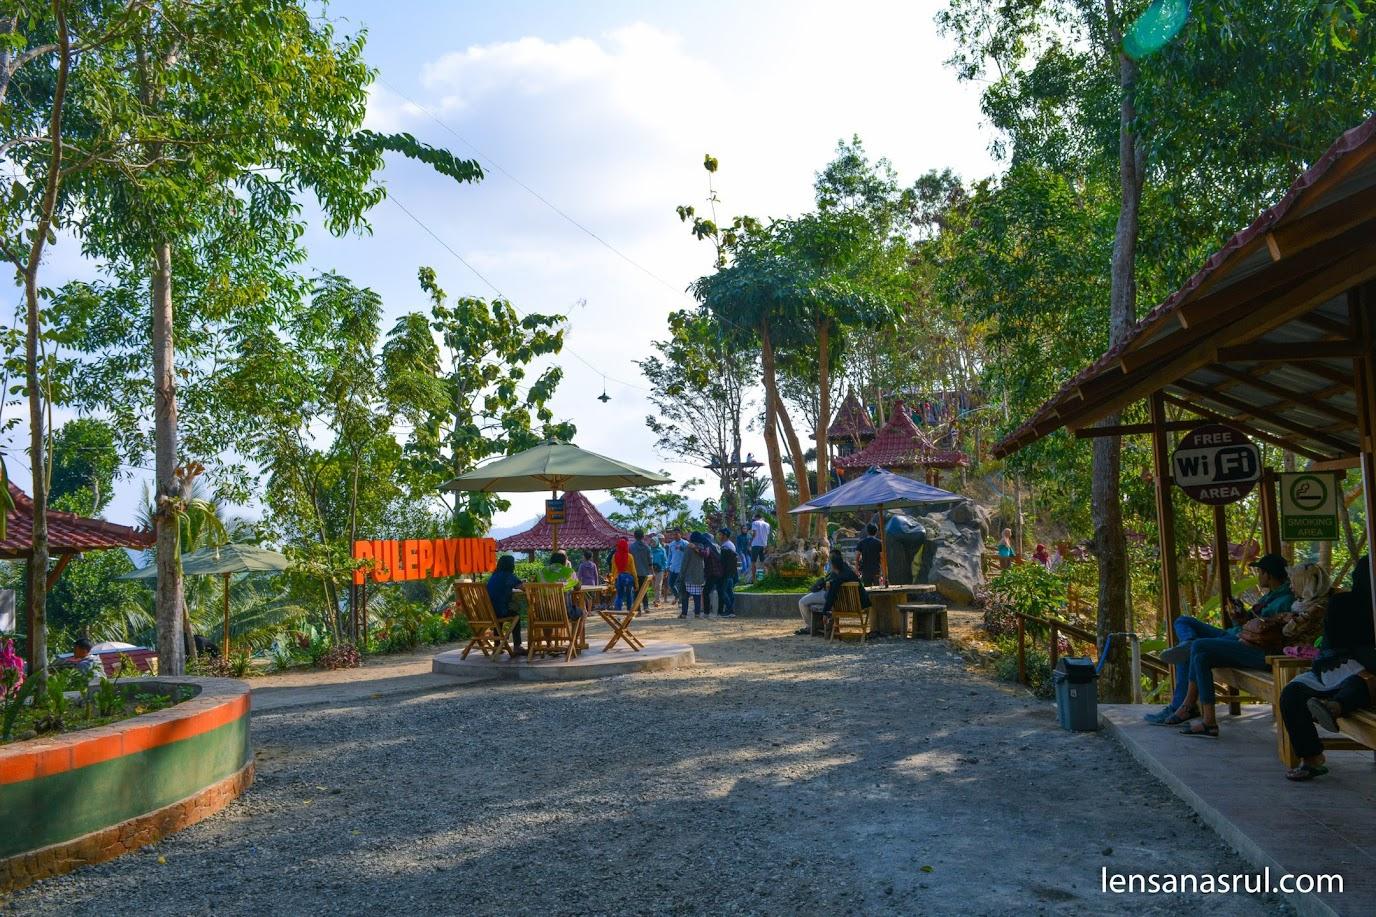 Suasana tempat santai wisata Pule Payung